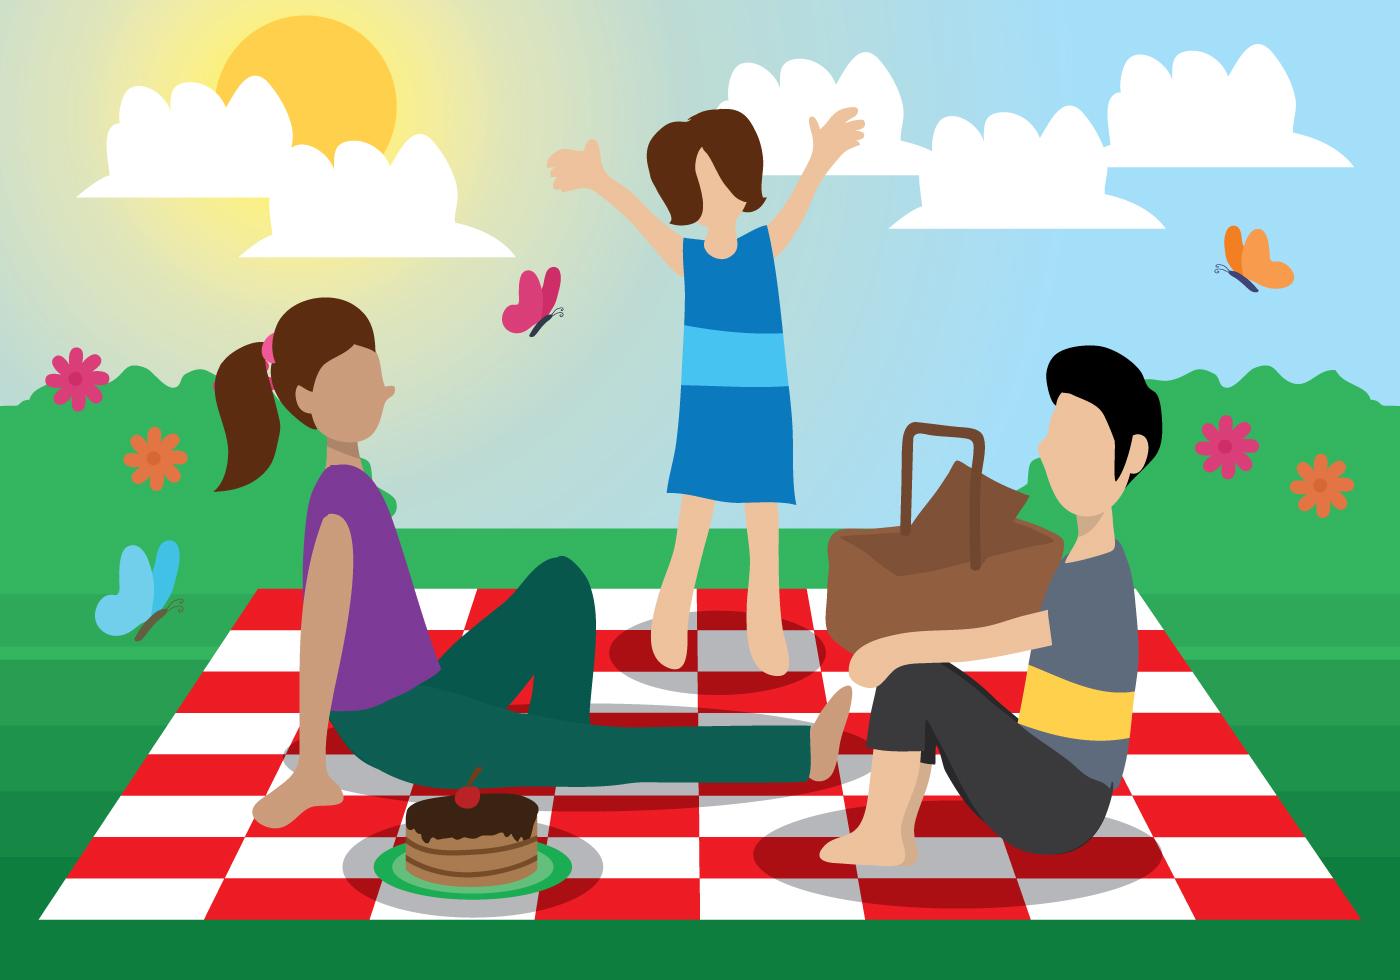 family picnic clipart - photo #45